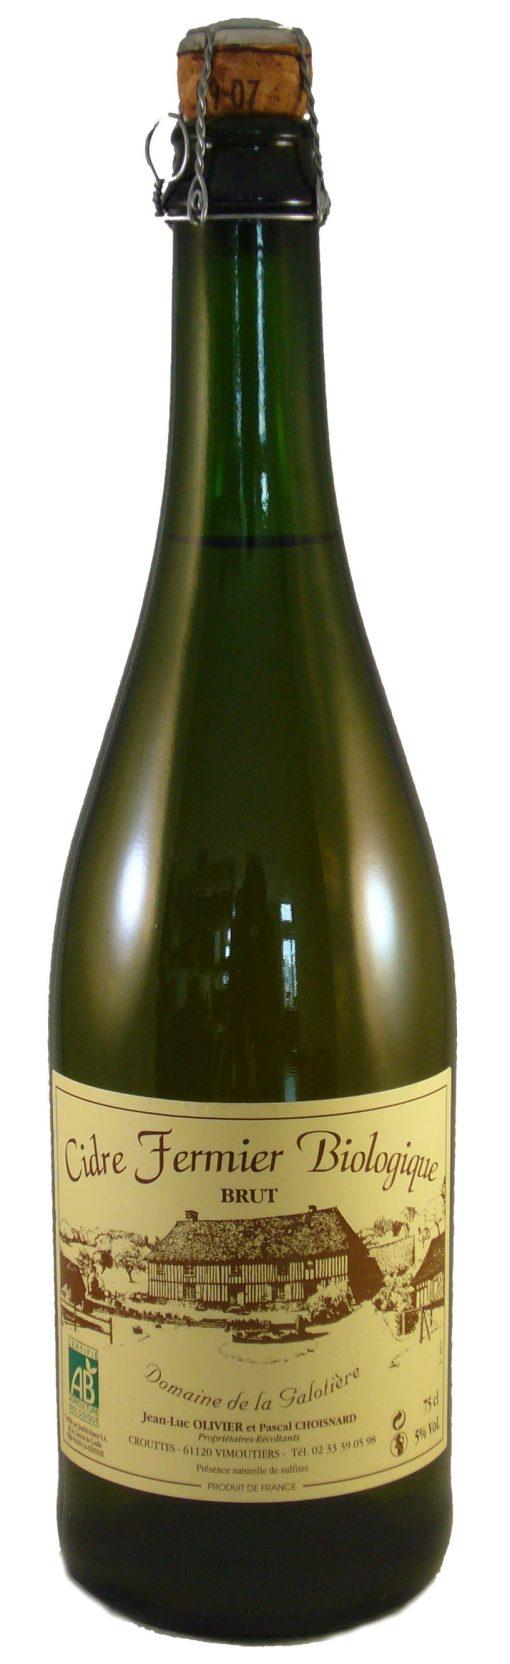 Cidre brut fermier Galotiere gemaakt door Domaine de La Galotière